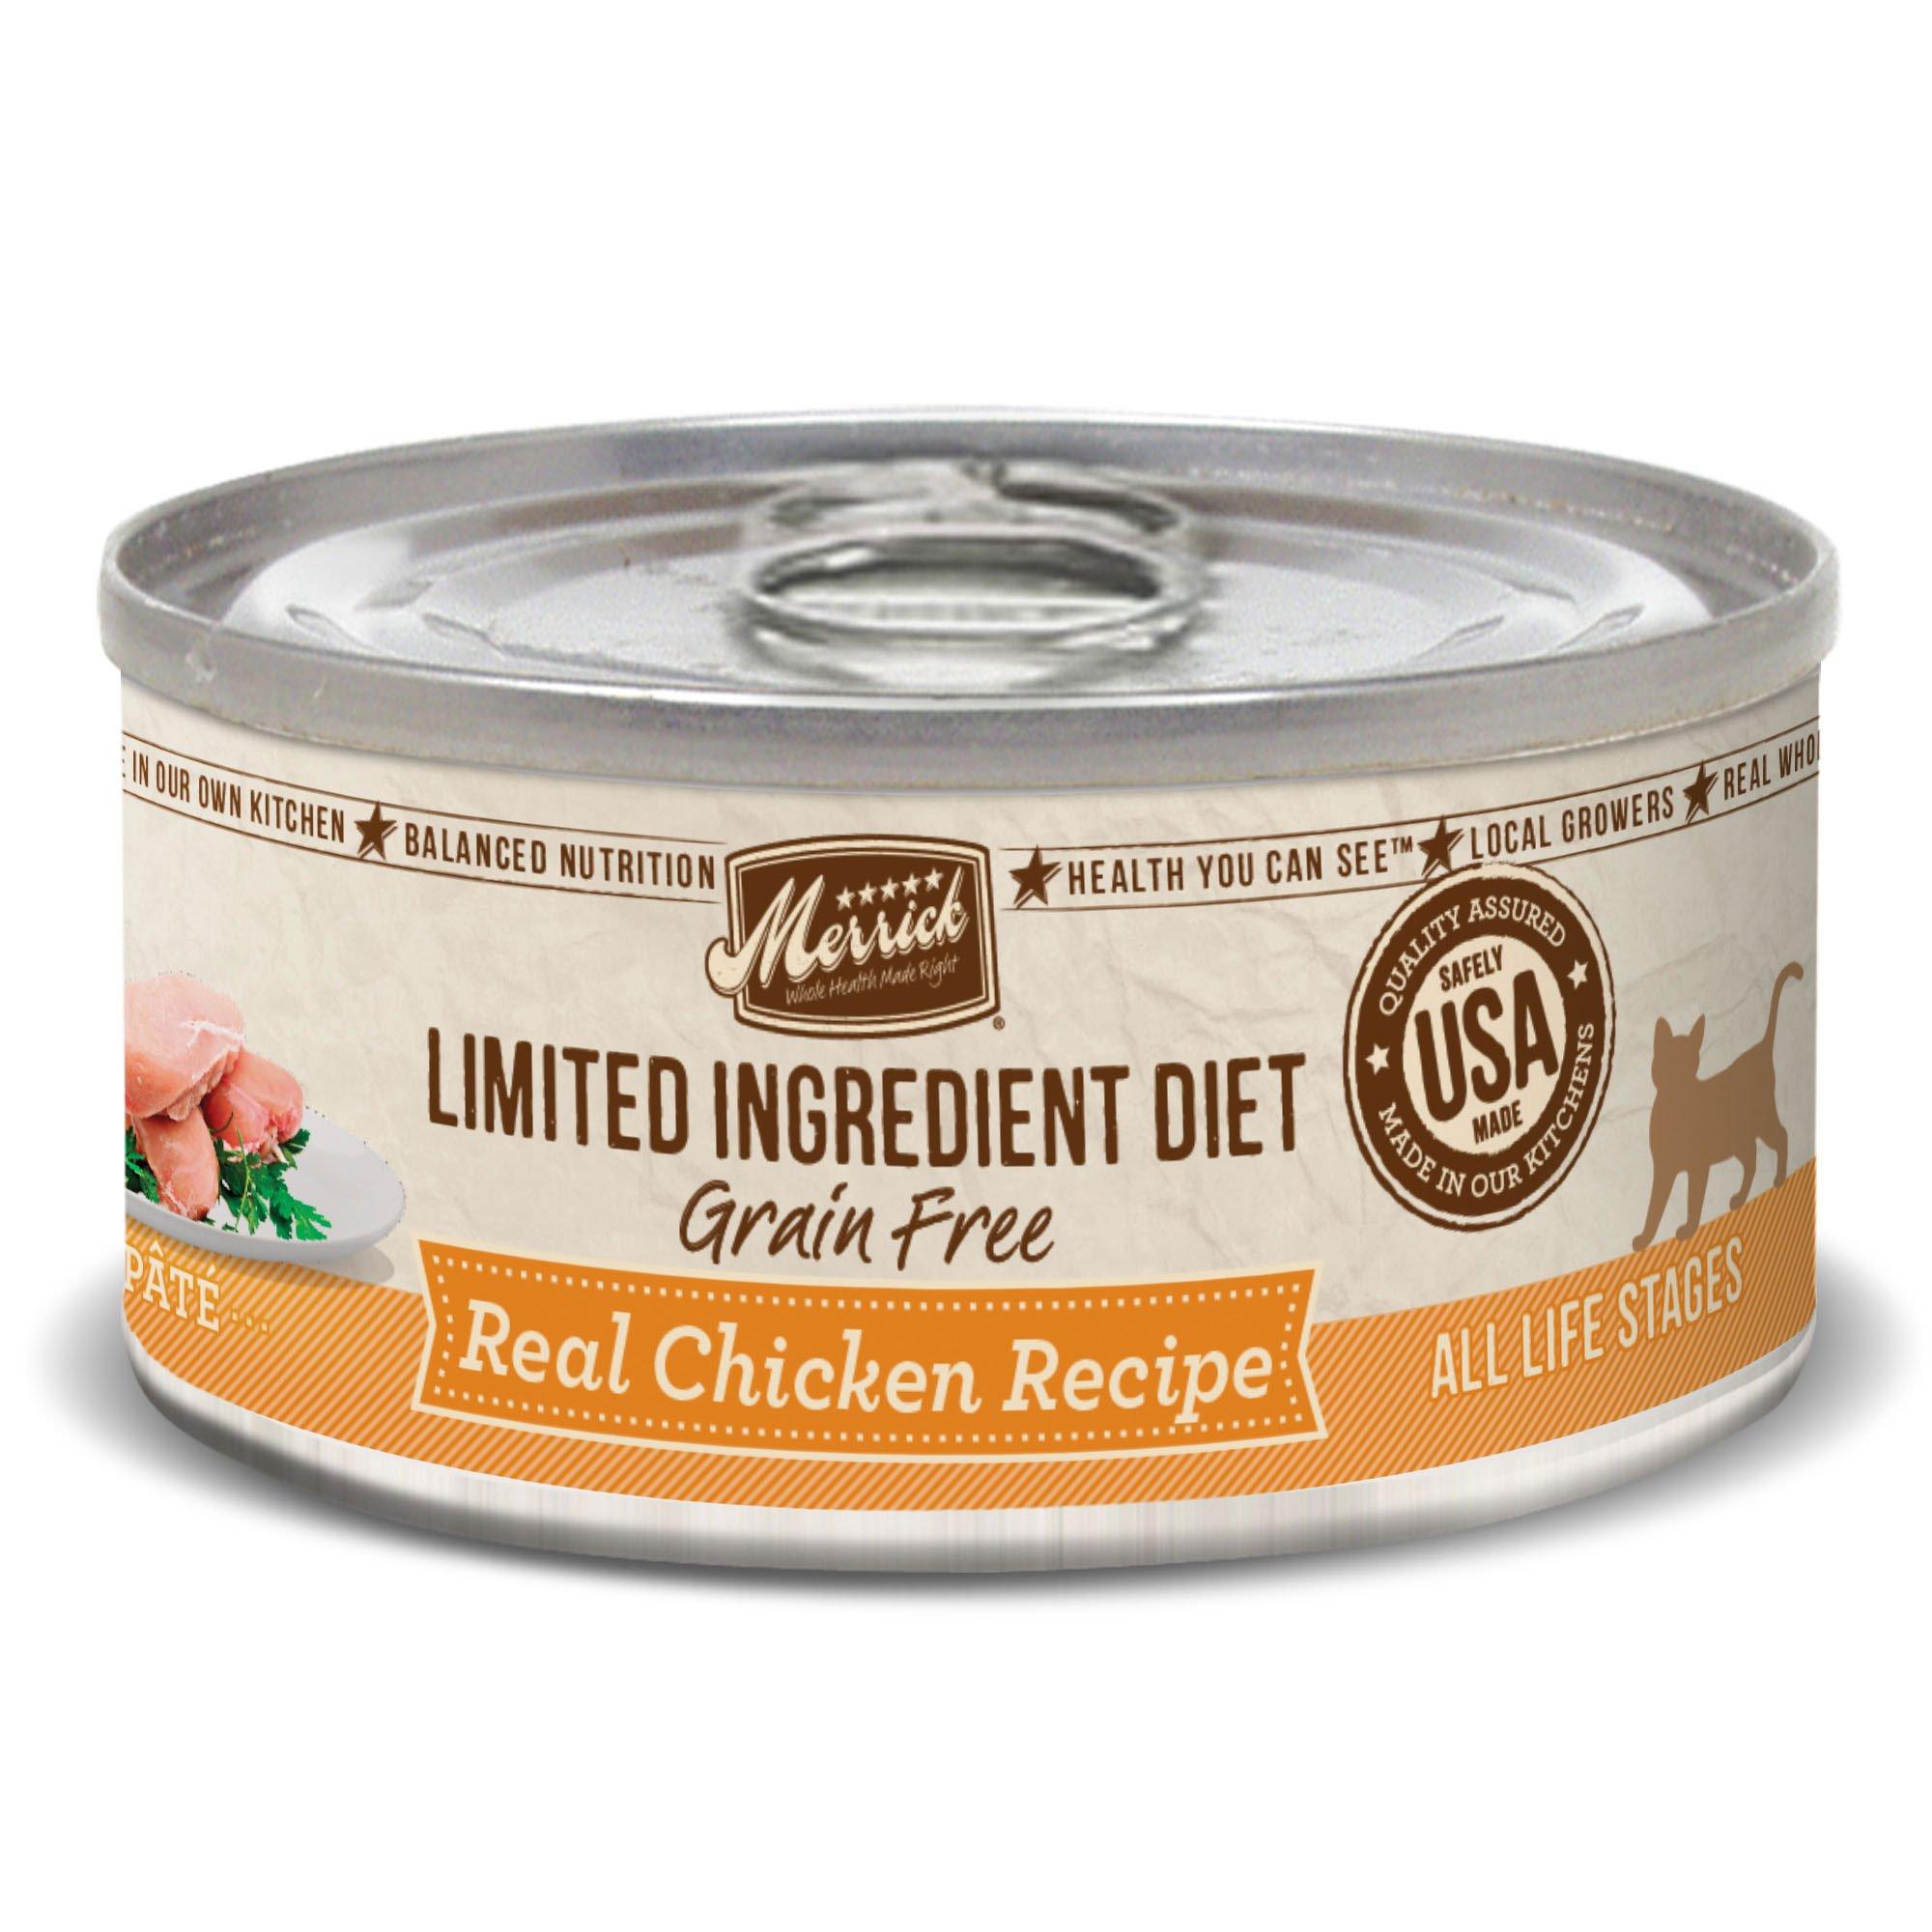 Merrick Limited Ingredient Diet Grain Free Chicken Canned Cat Food